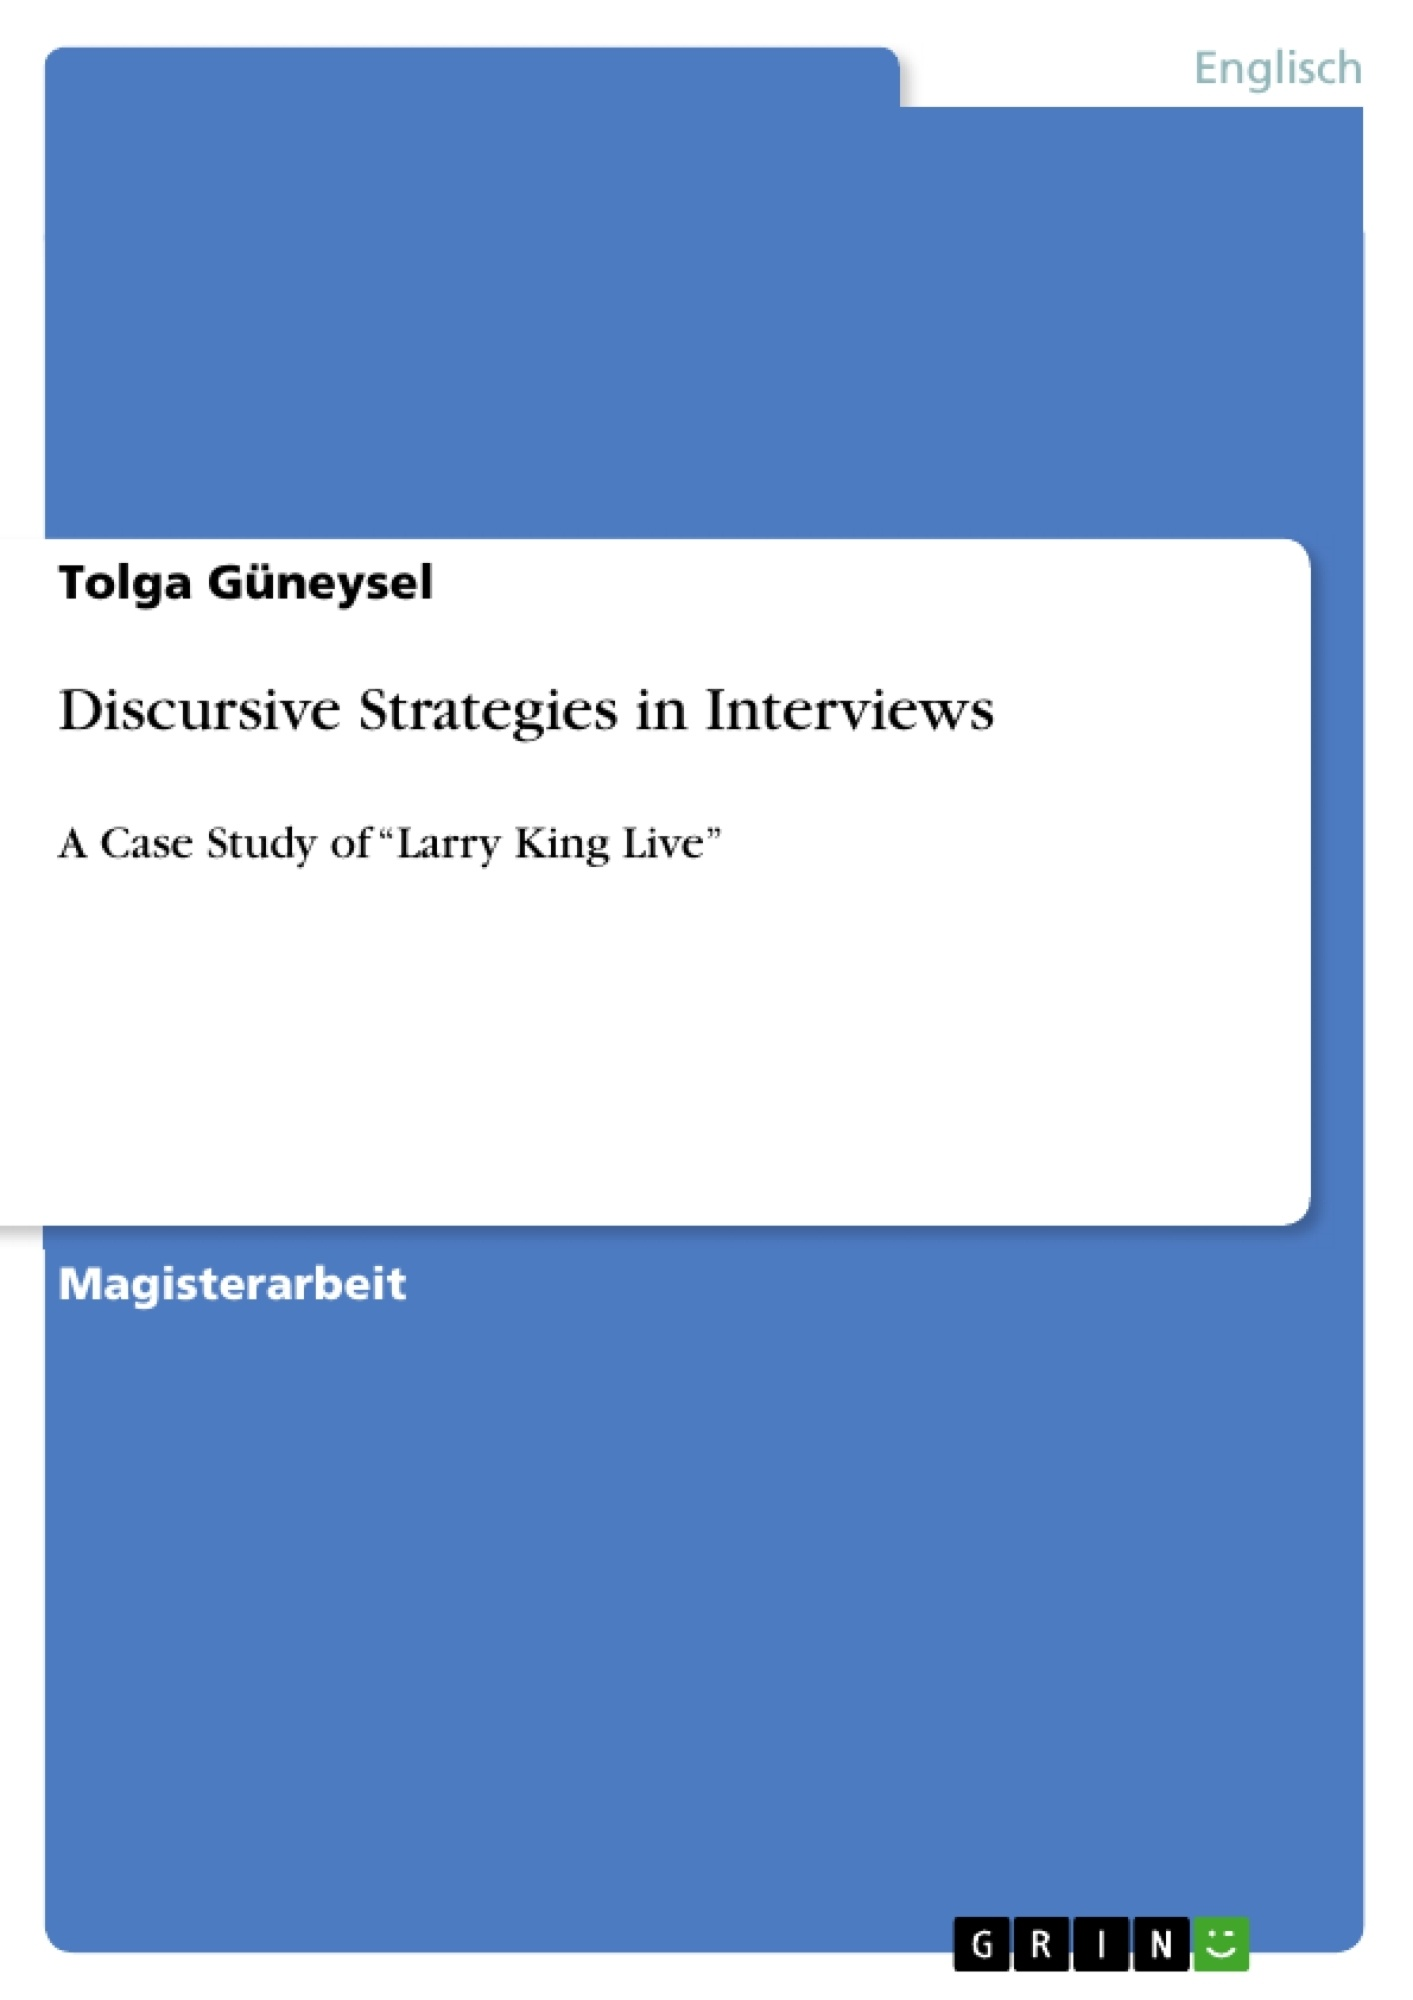 Titel: Discursive Strategies in Interviews